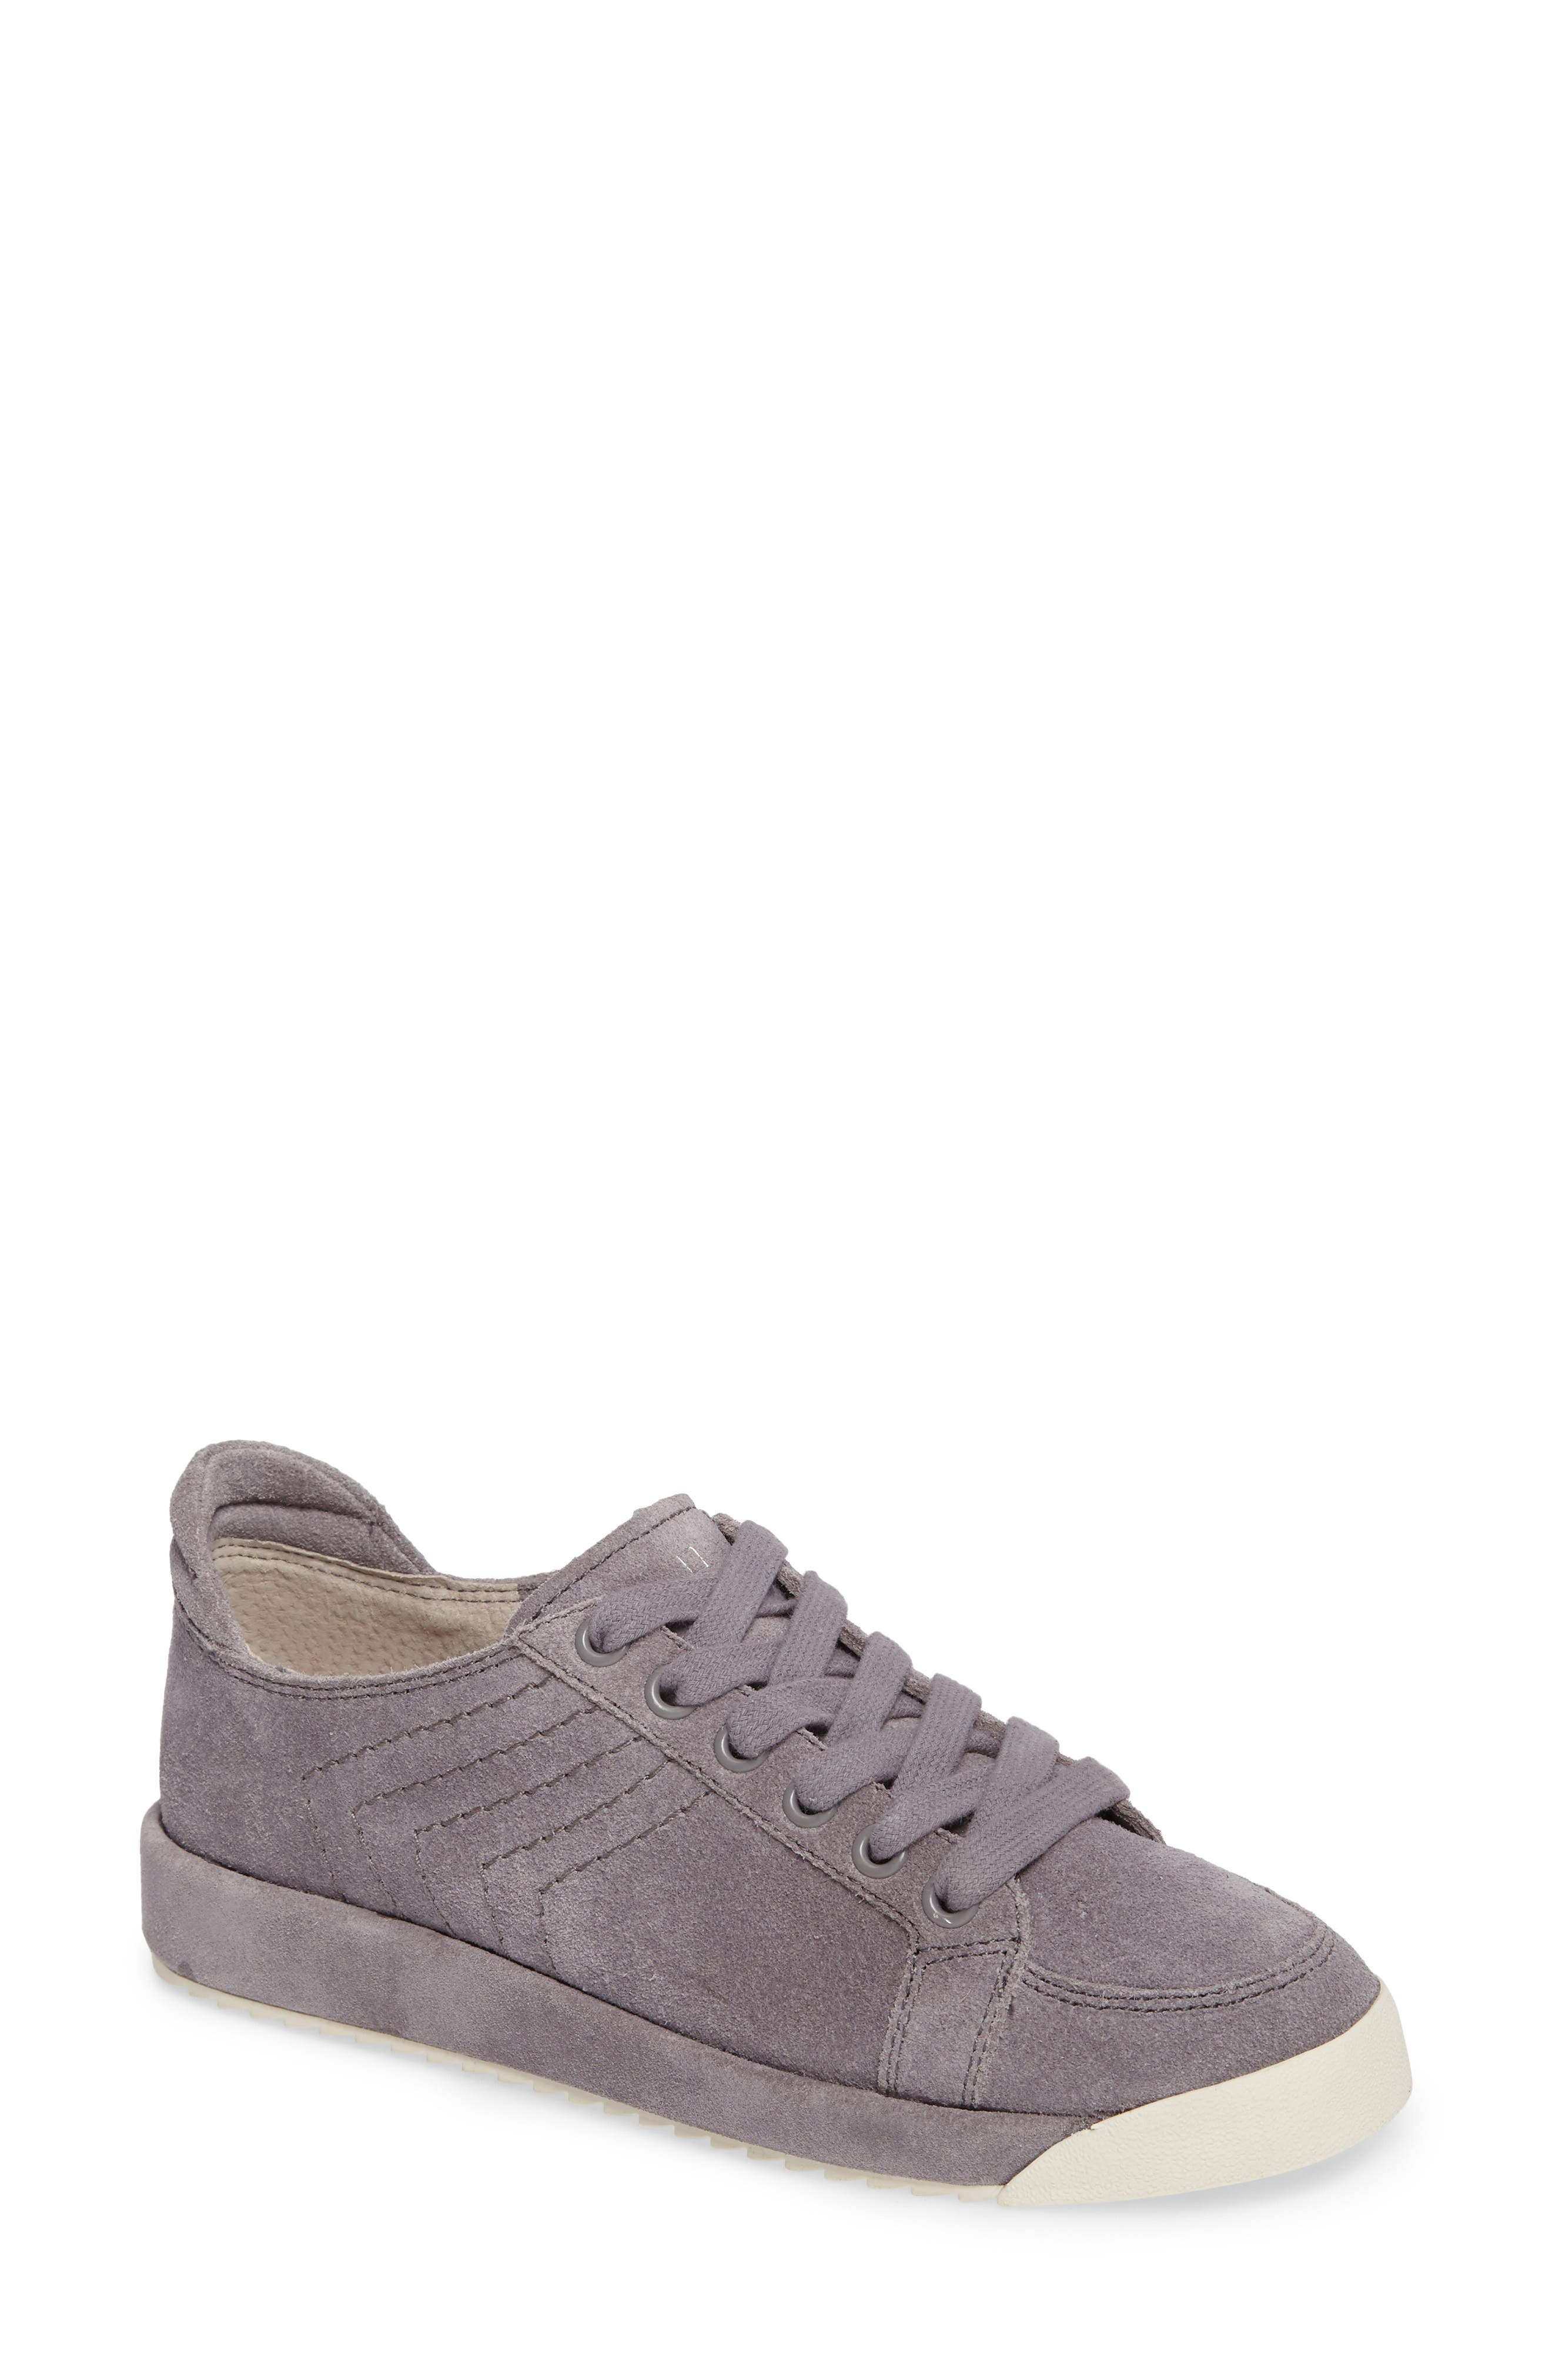 Sage Low-Top Sneaker,                         Main,                         color, 020